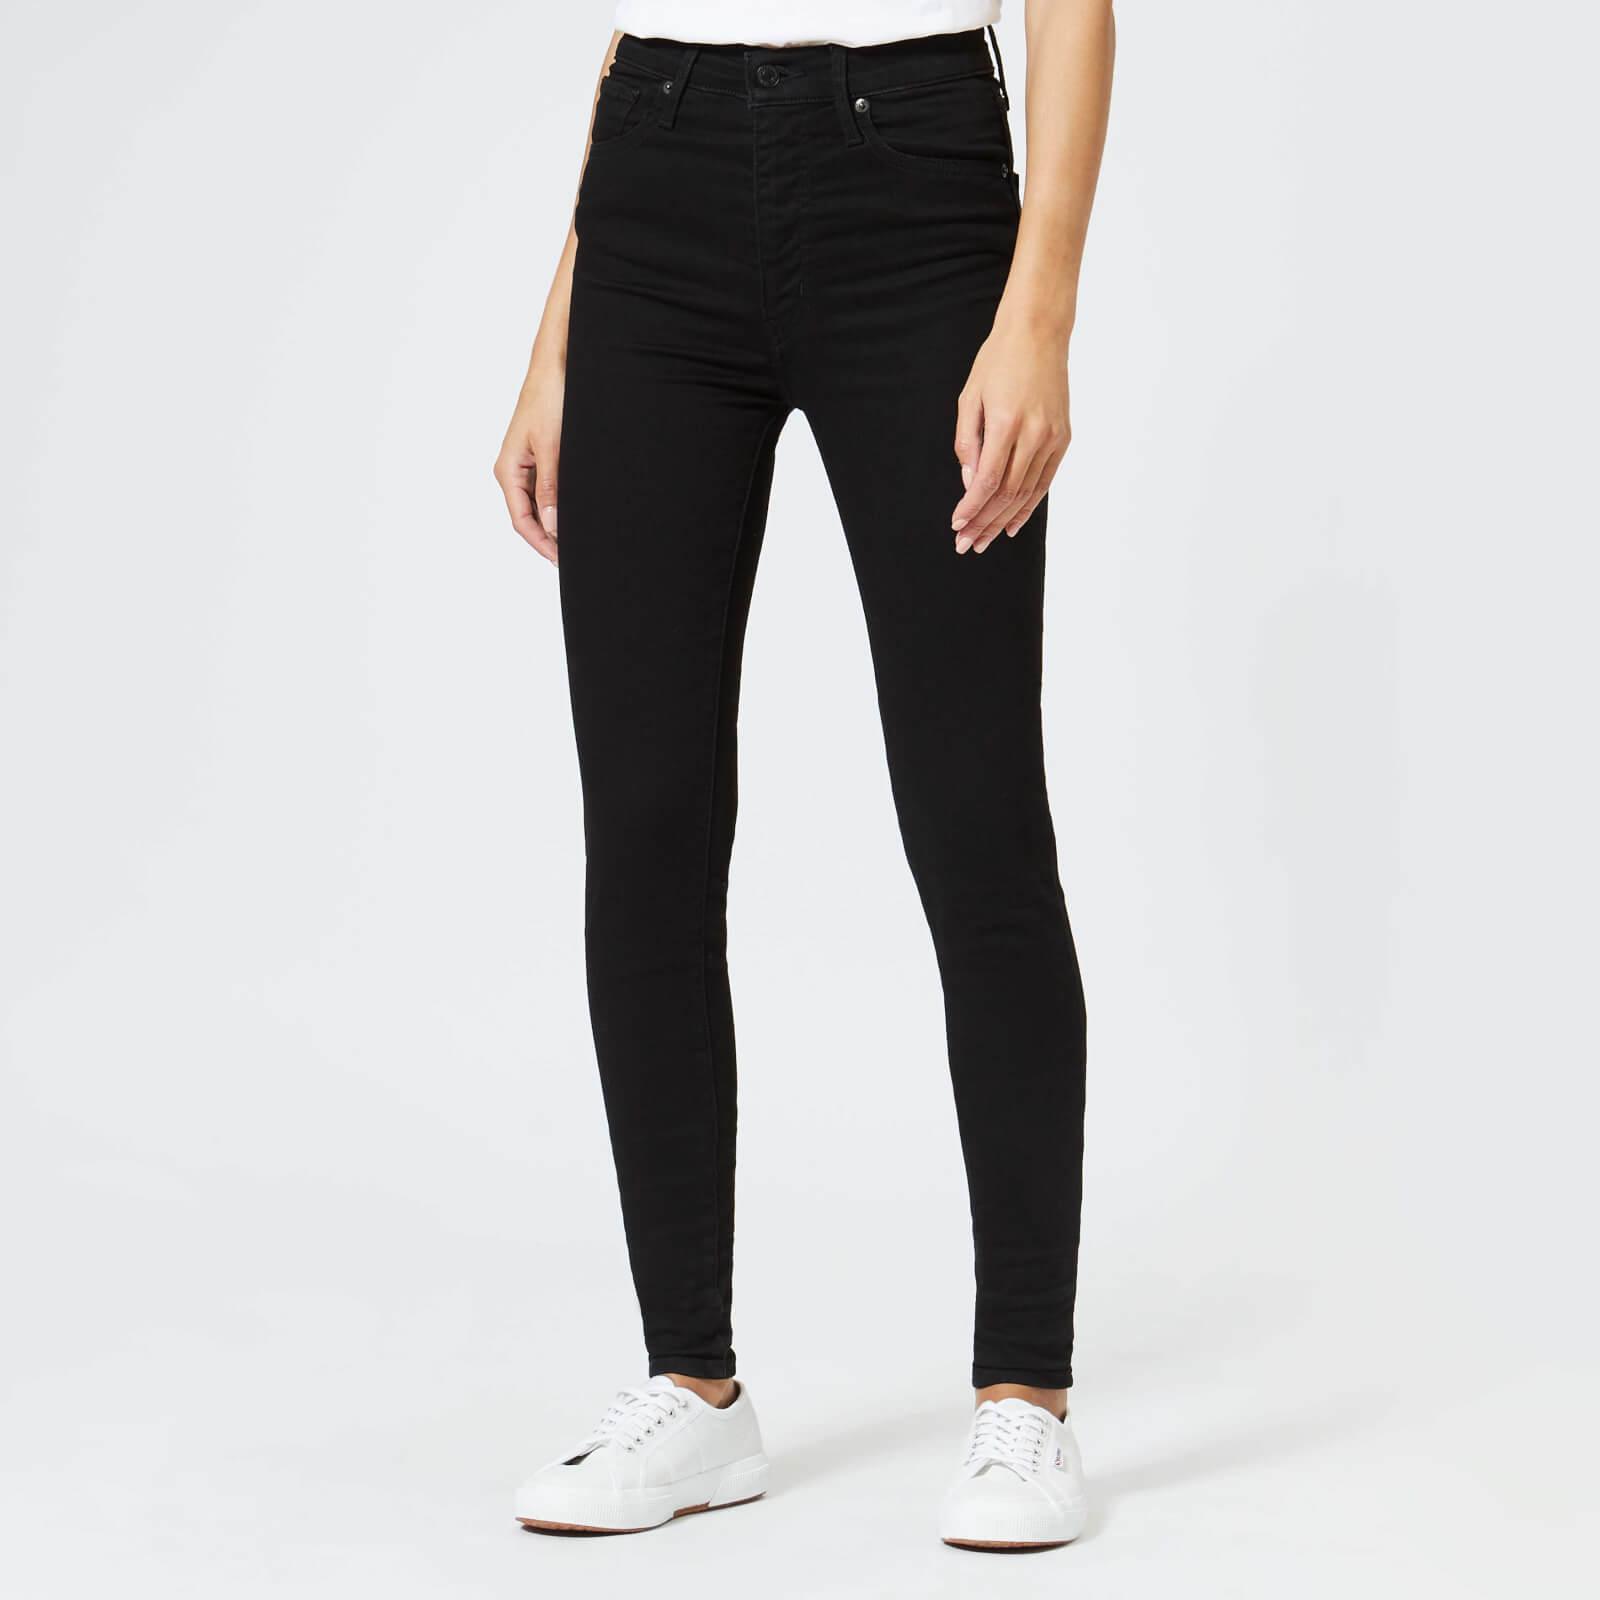 Levi's s Mile High Super Skinny Jeans - Black Galaxy - W29/L30